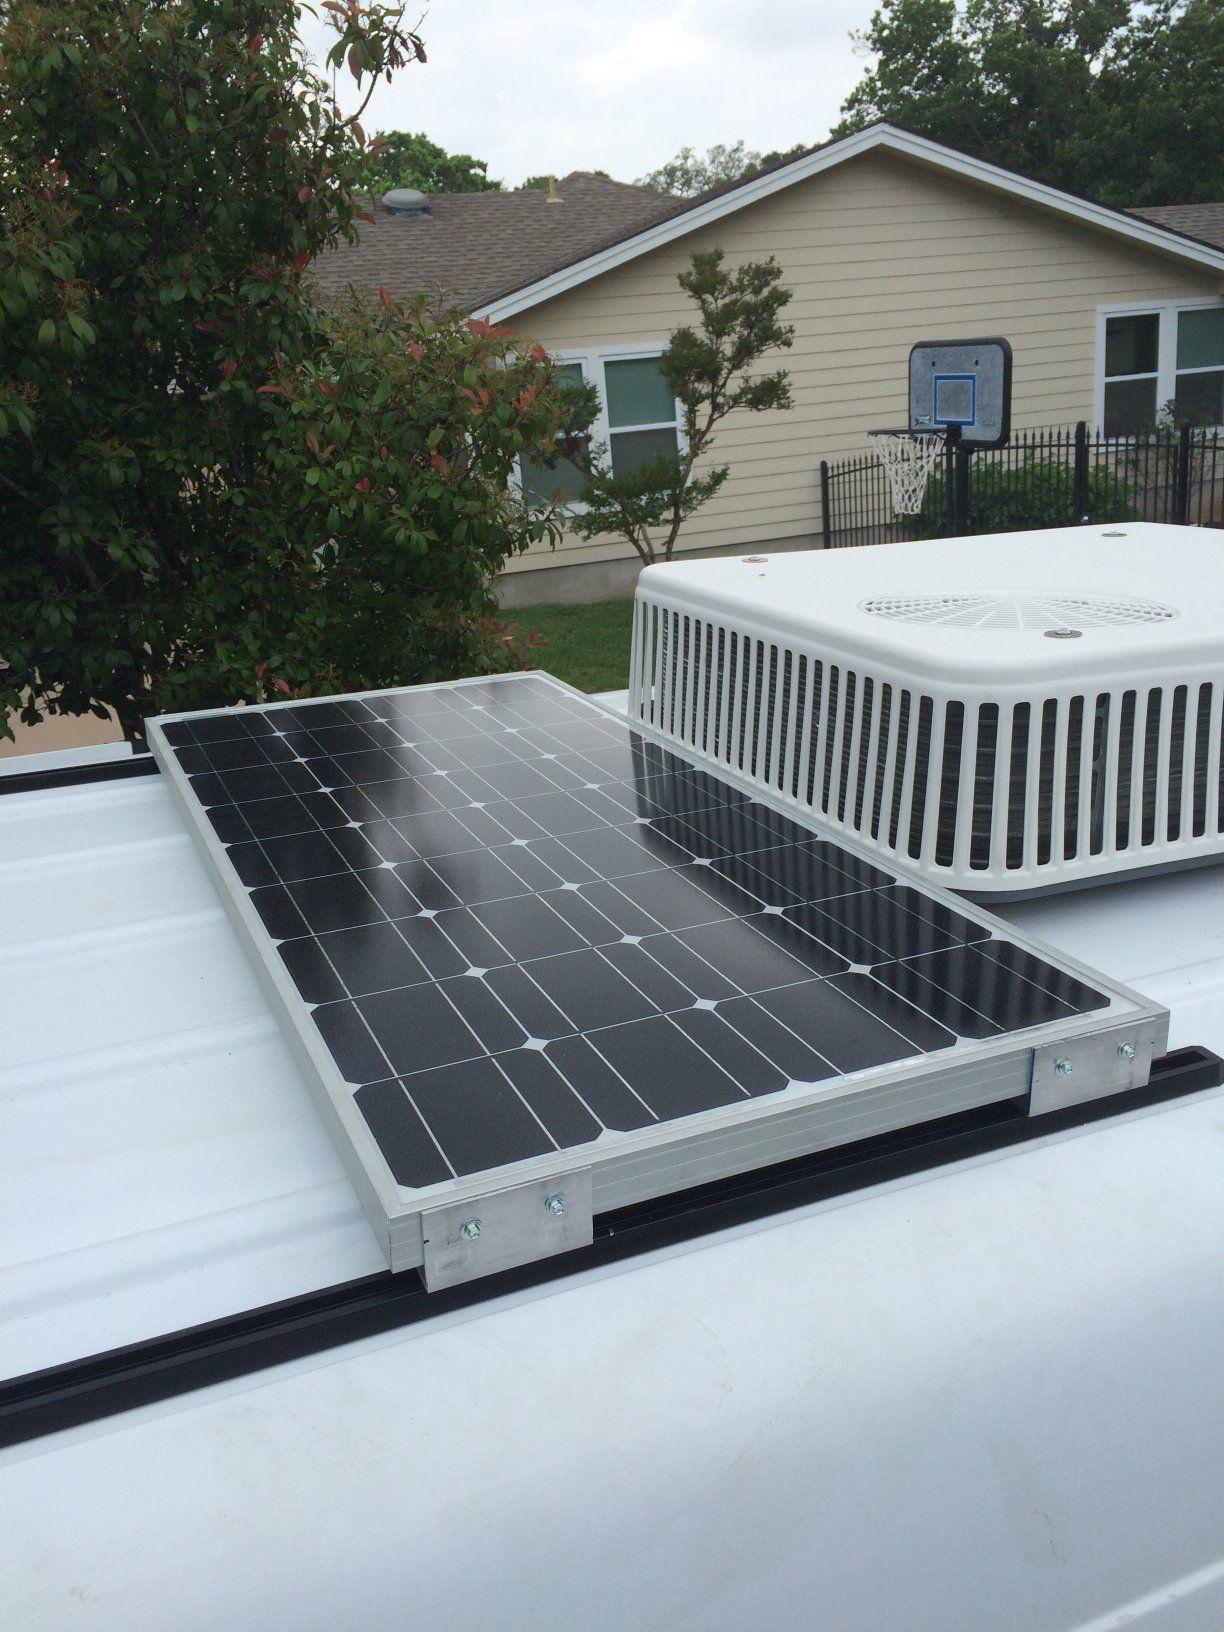 Solar Panel On A Proline Roof Track System Solar Panels